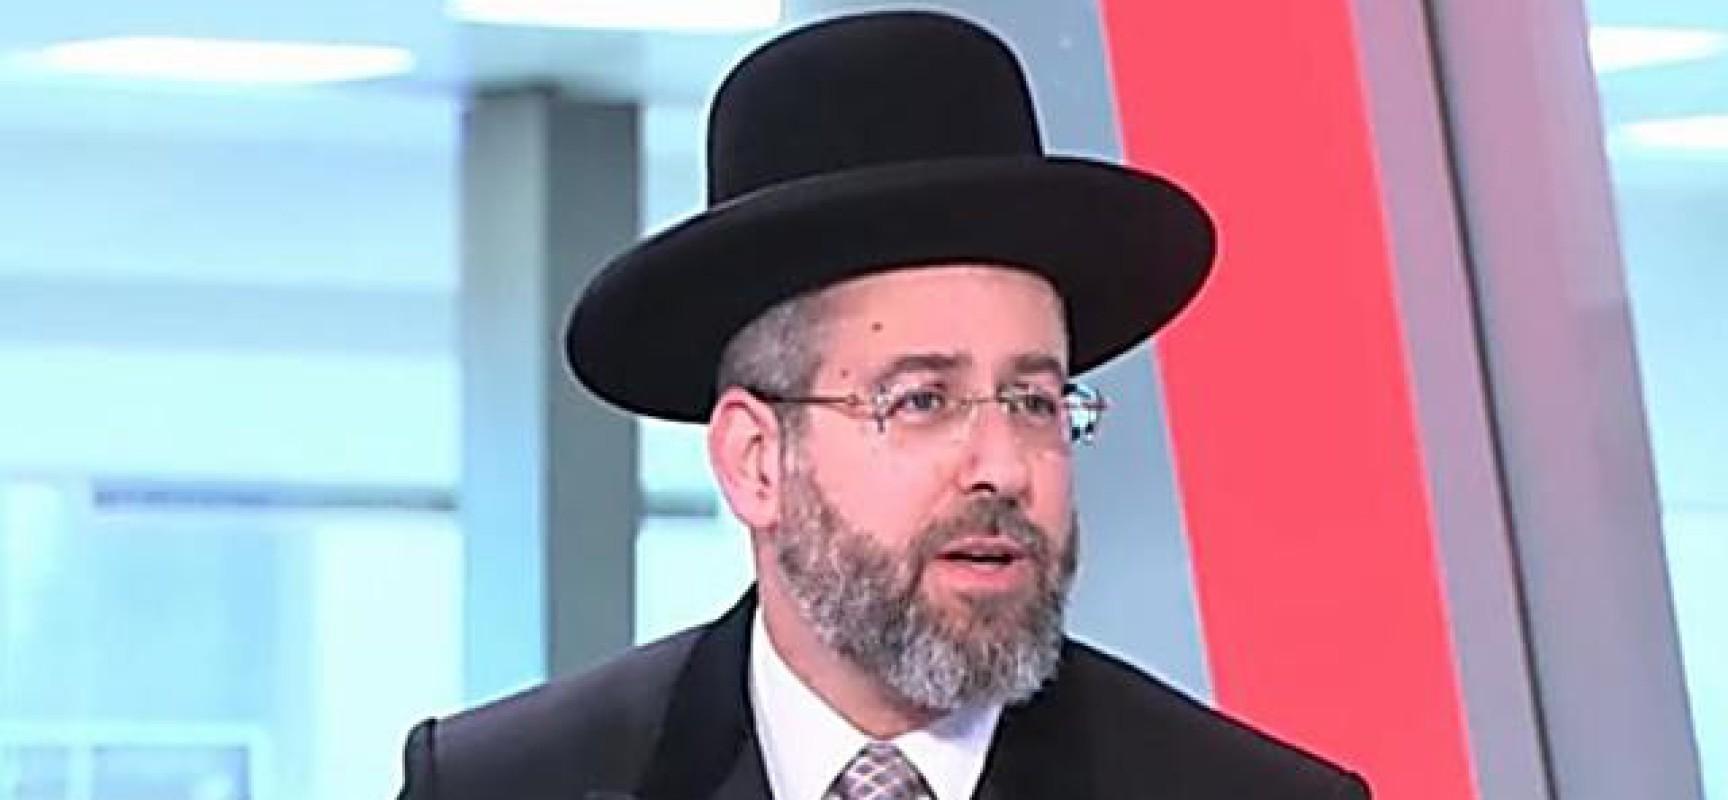 incontri ebraici ultra ortodossi Ciara incontri Reggie Bush